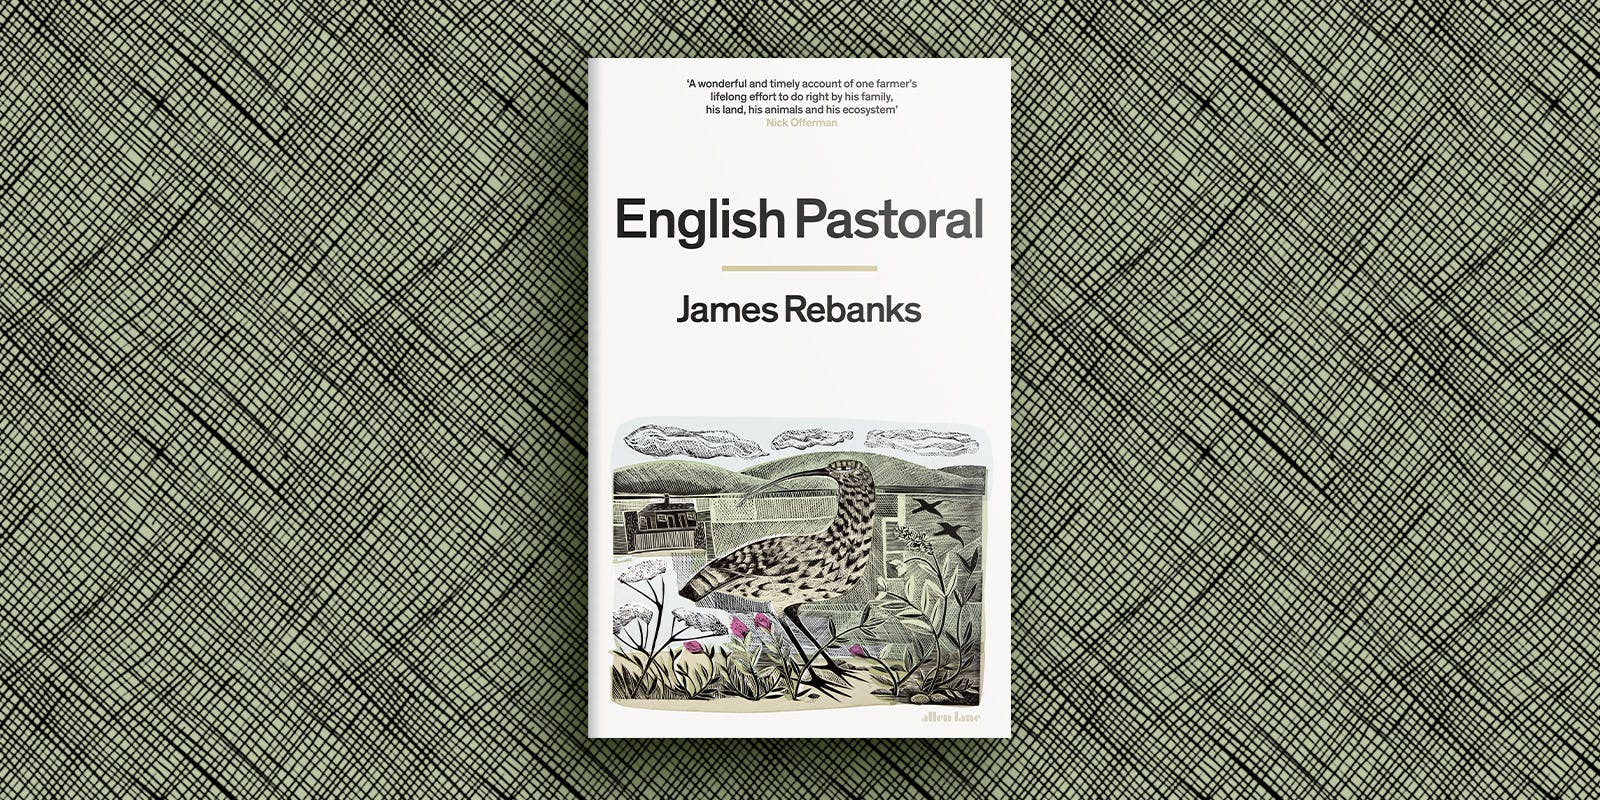 James Rebanks Q&A